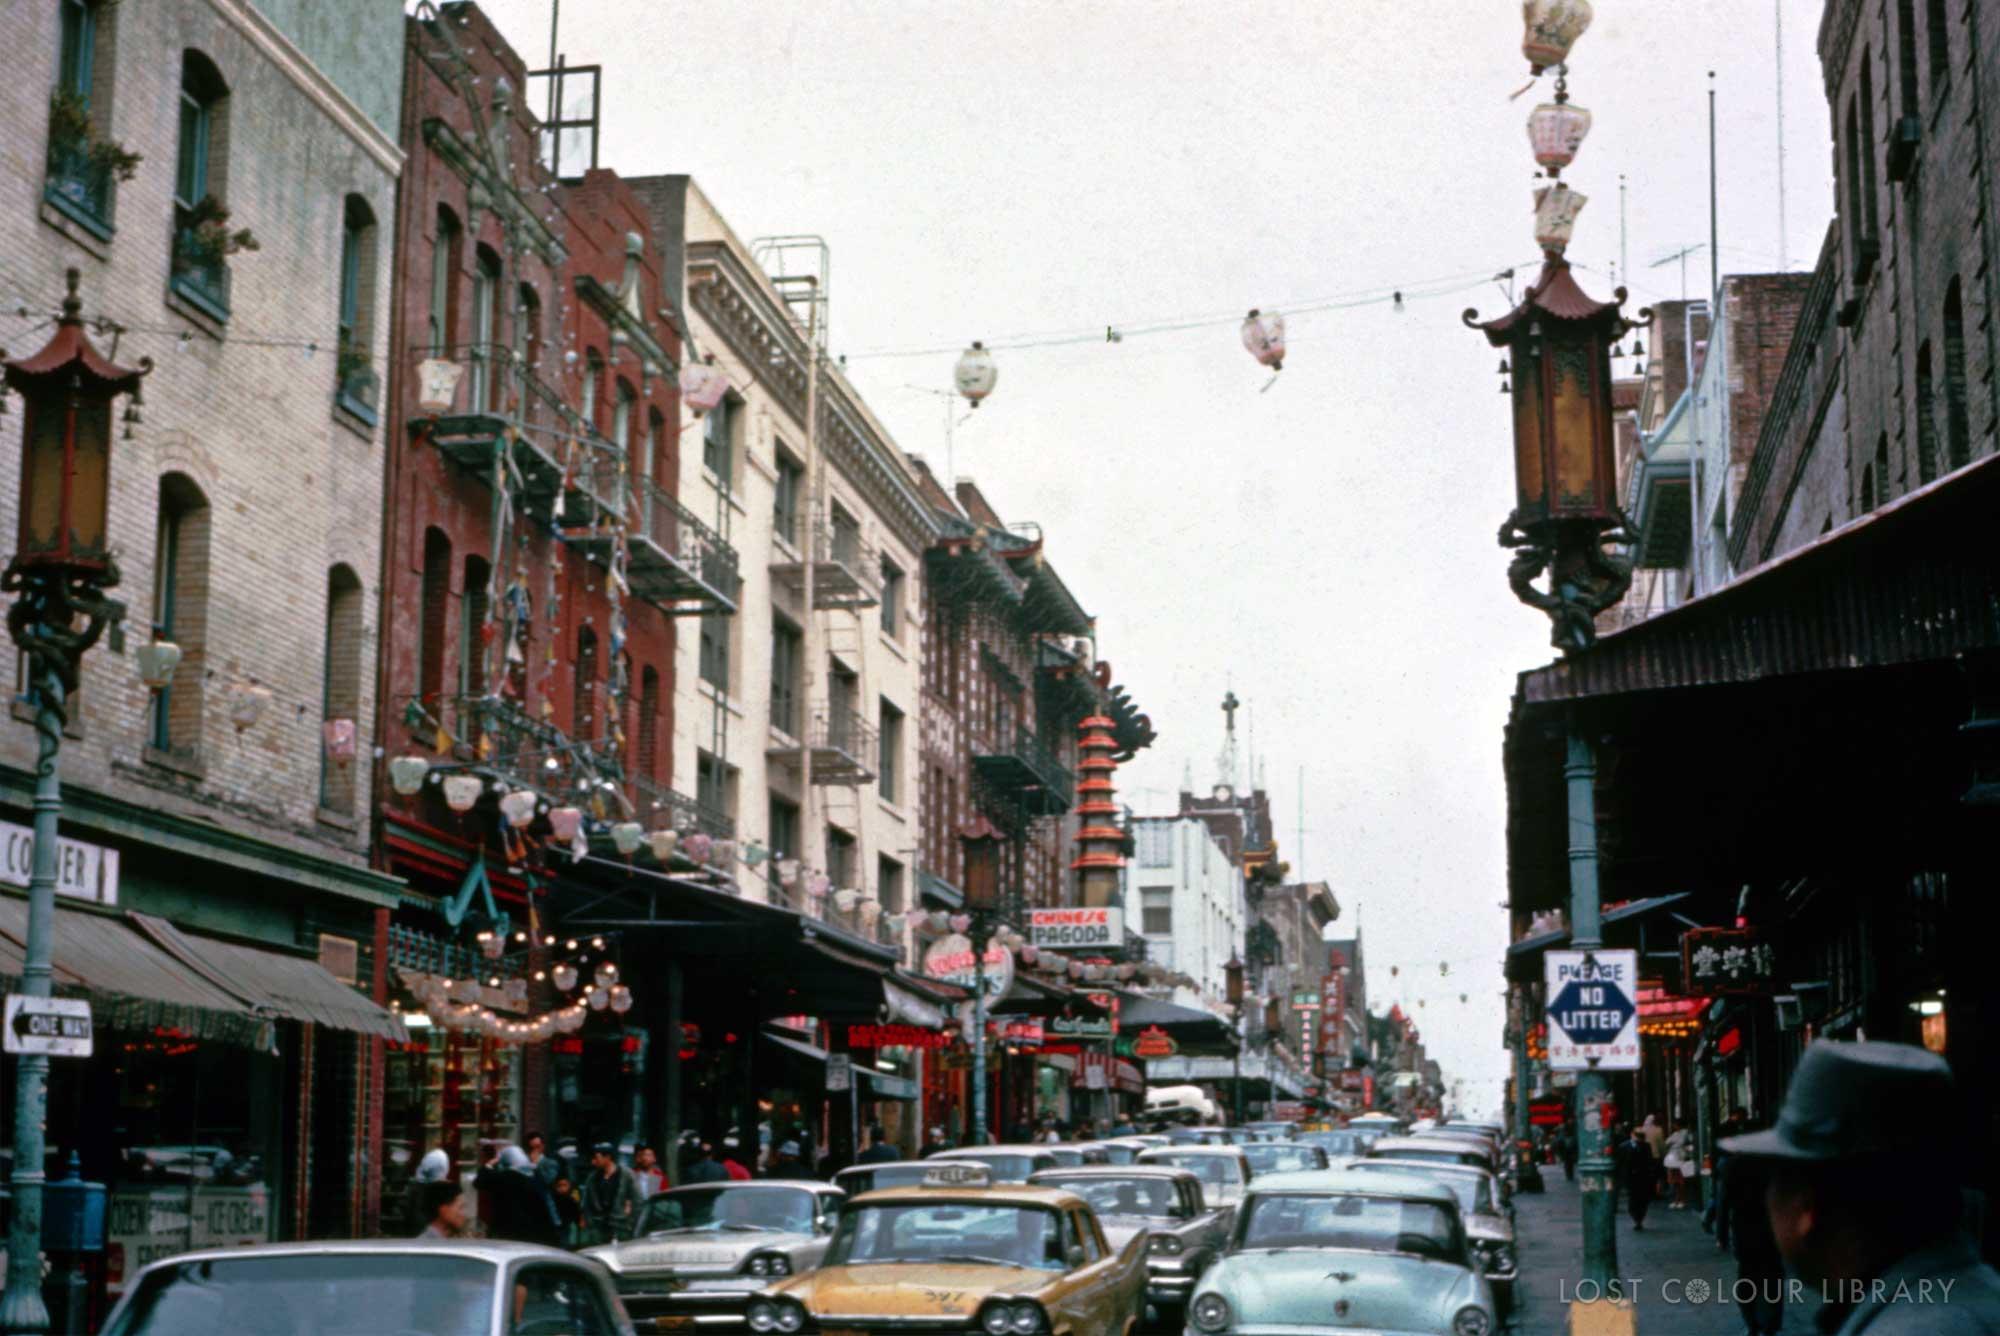 lcl-ww-chinatown-c-1960-site-wm.jpg